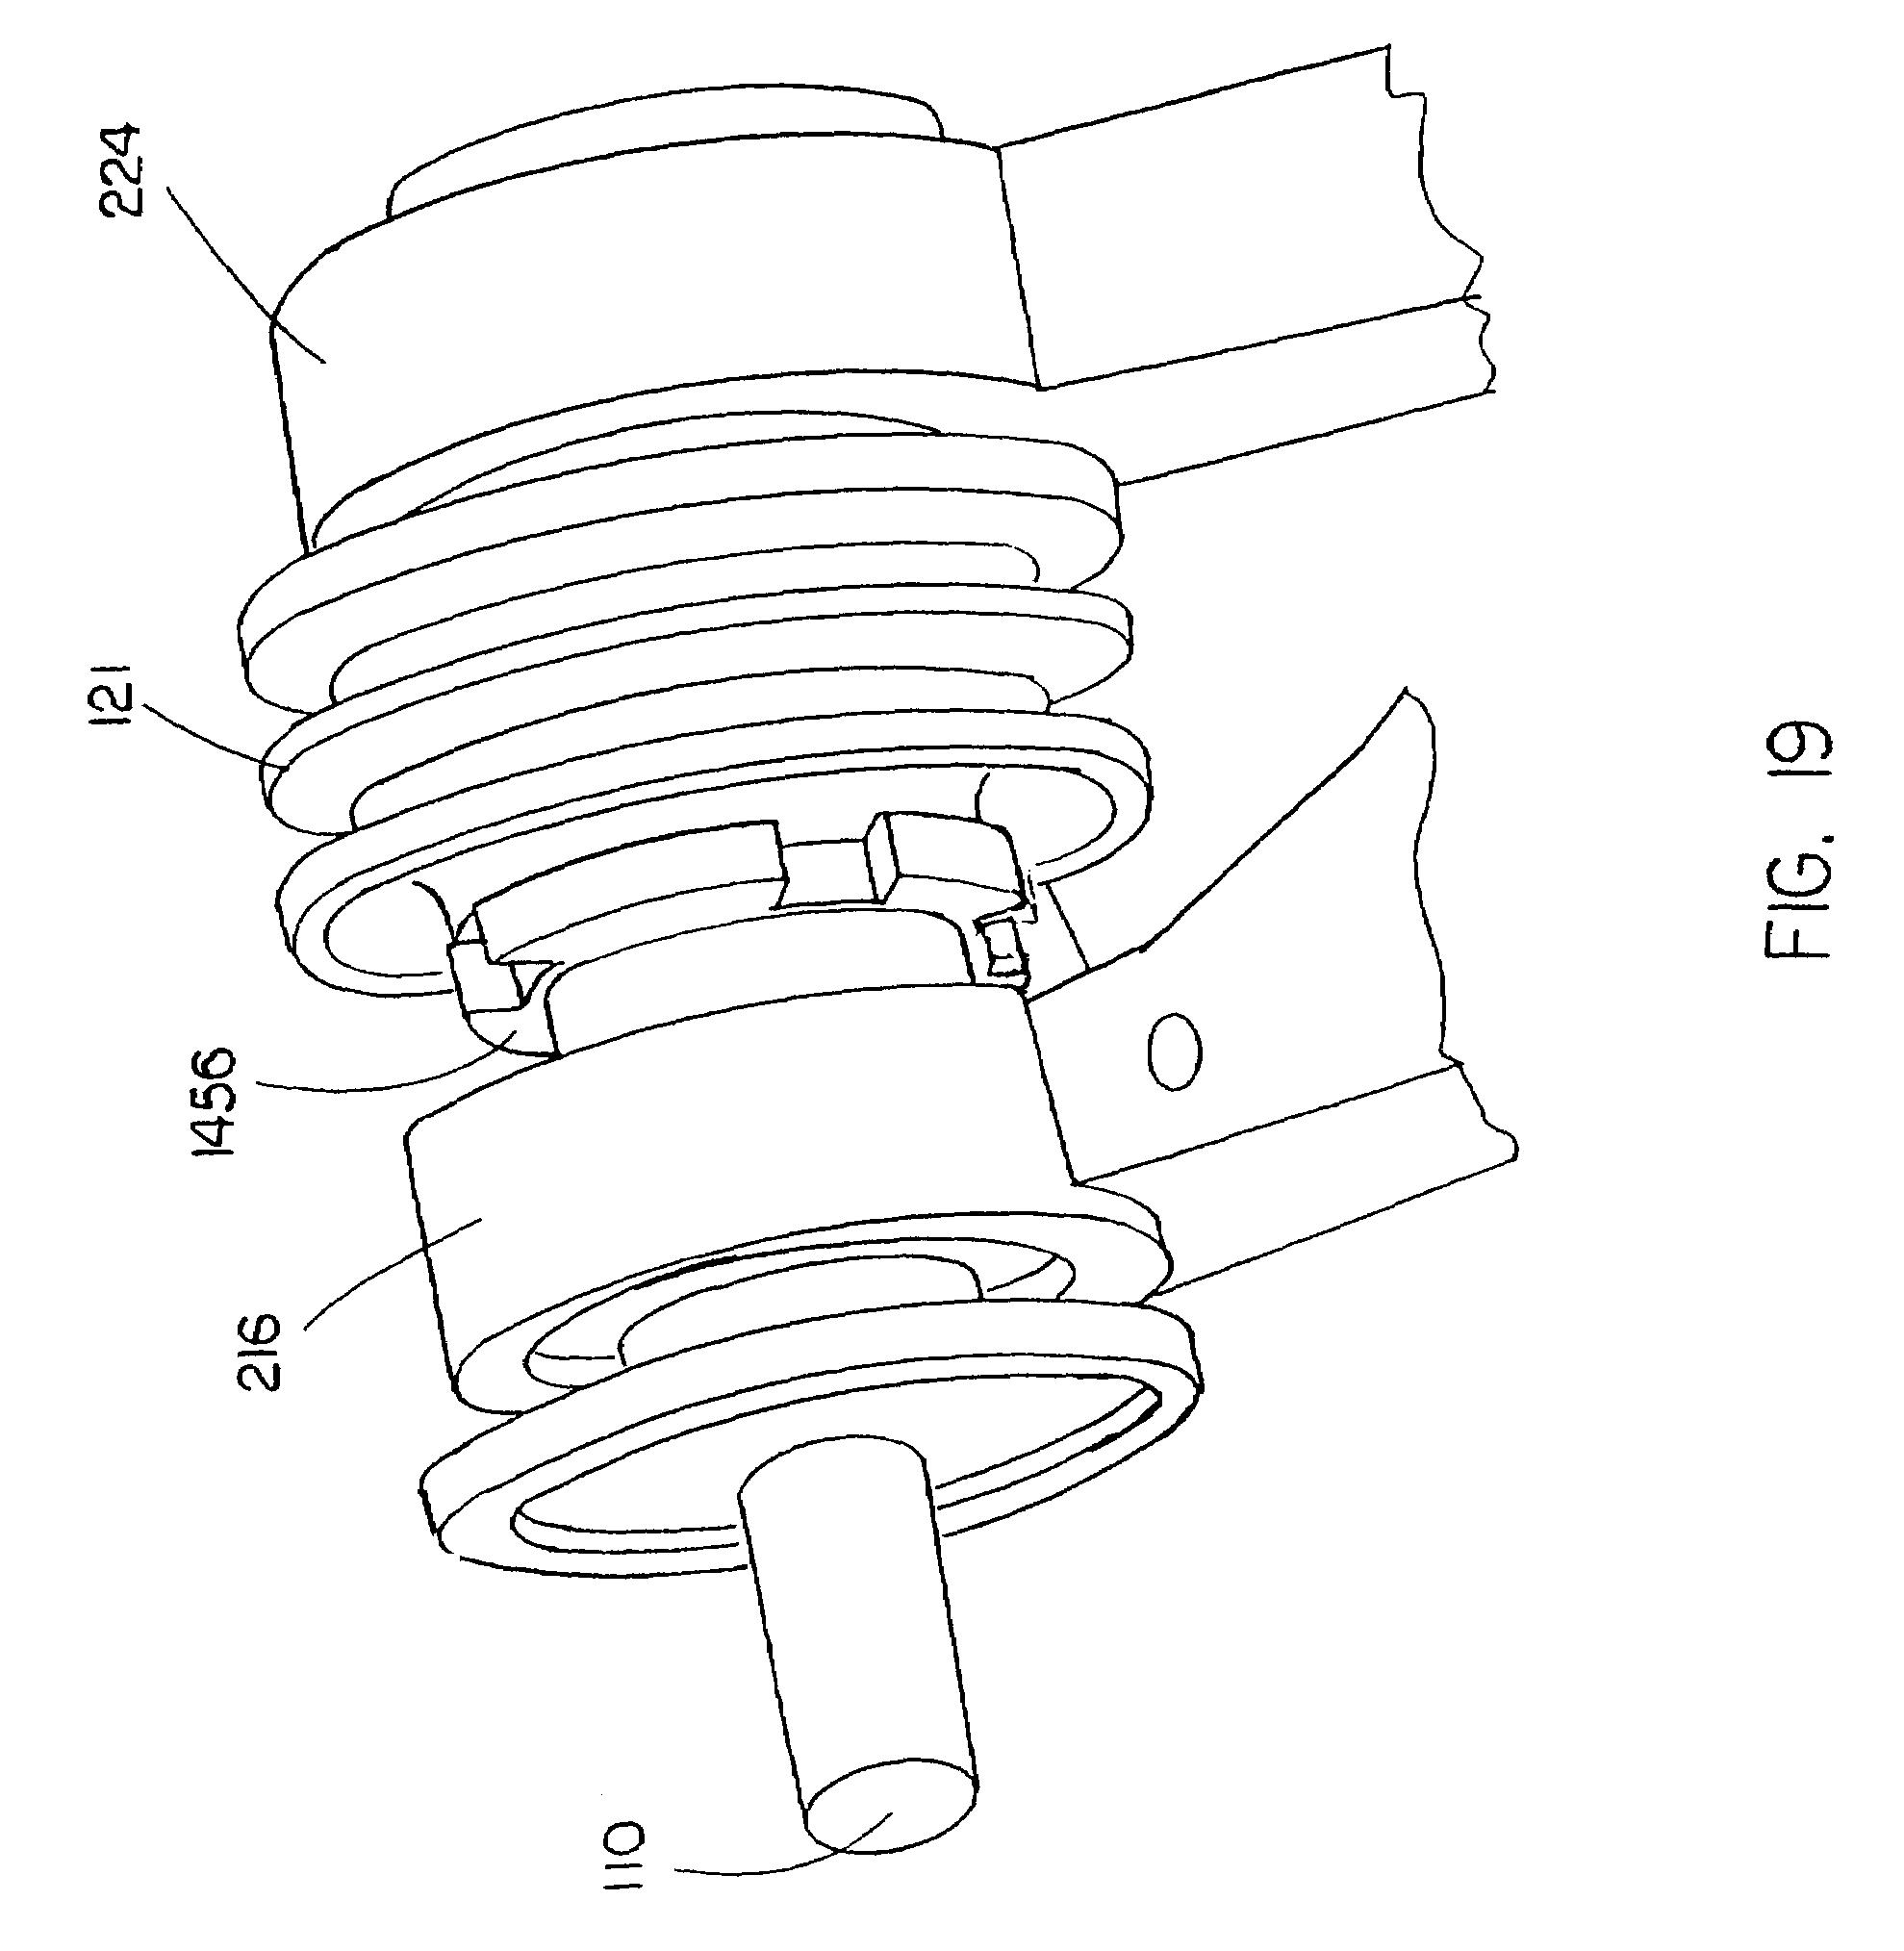 Fiat 500 headlight fuse security camera wiring schematic diy install eibach springs fiat abarth fiat 500